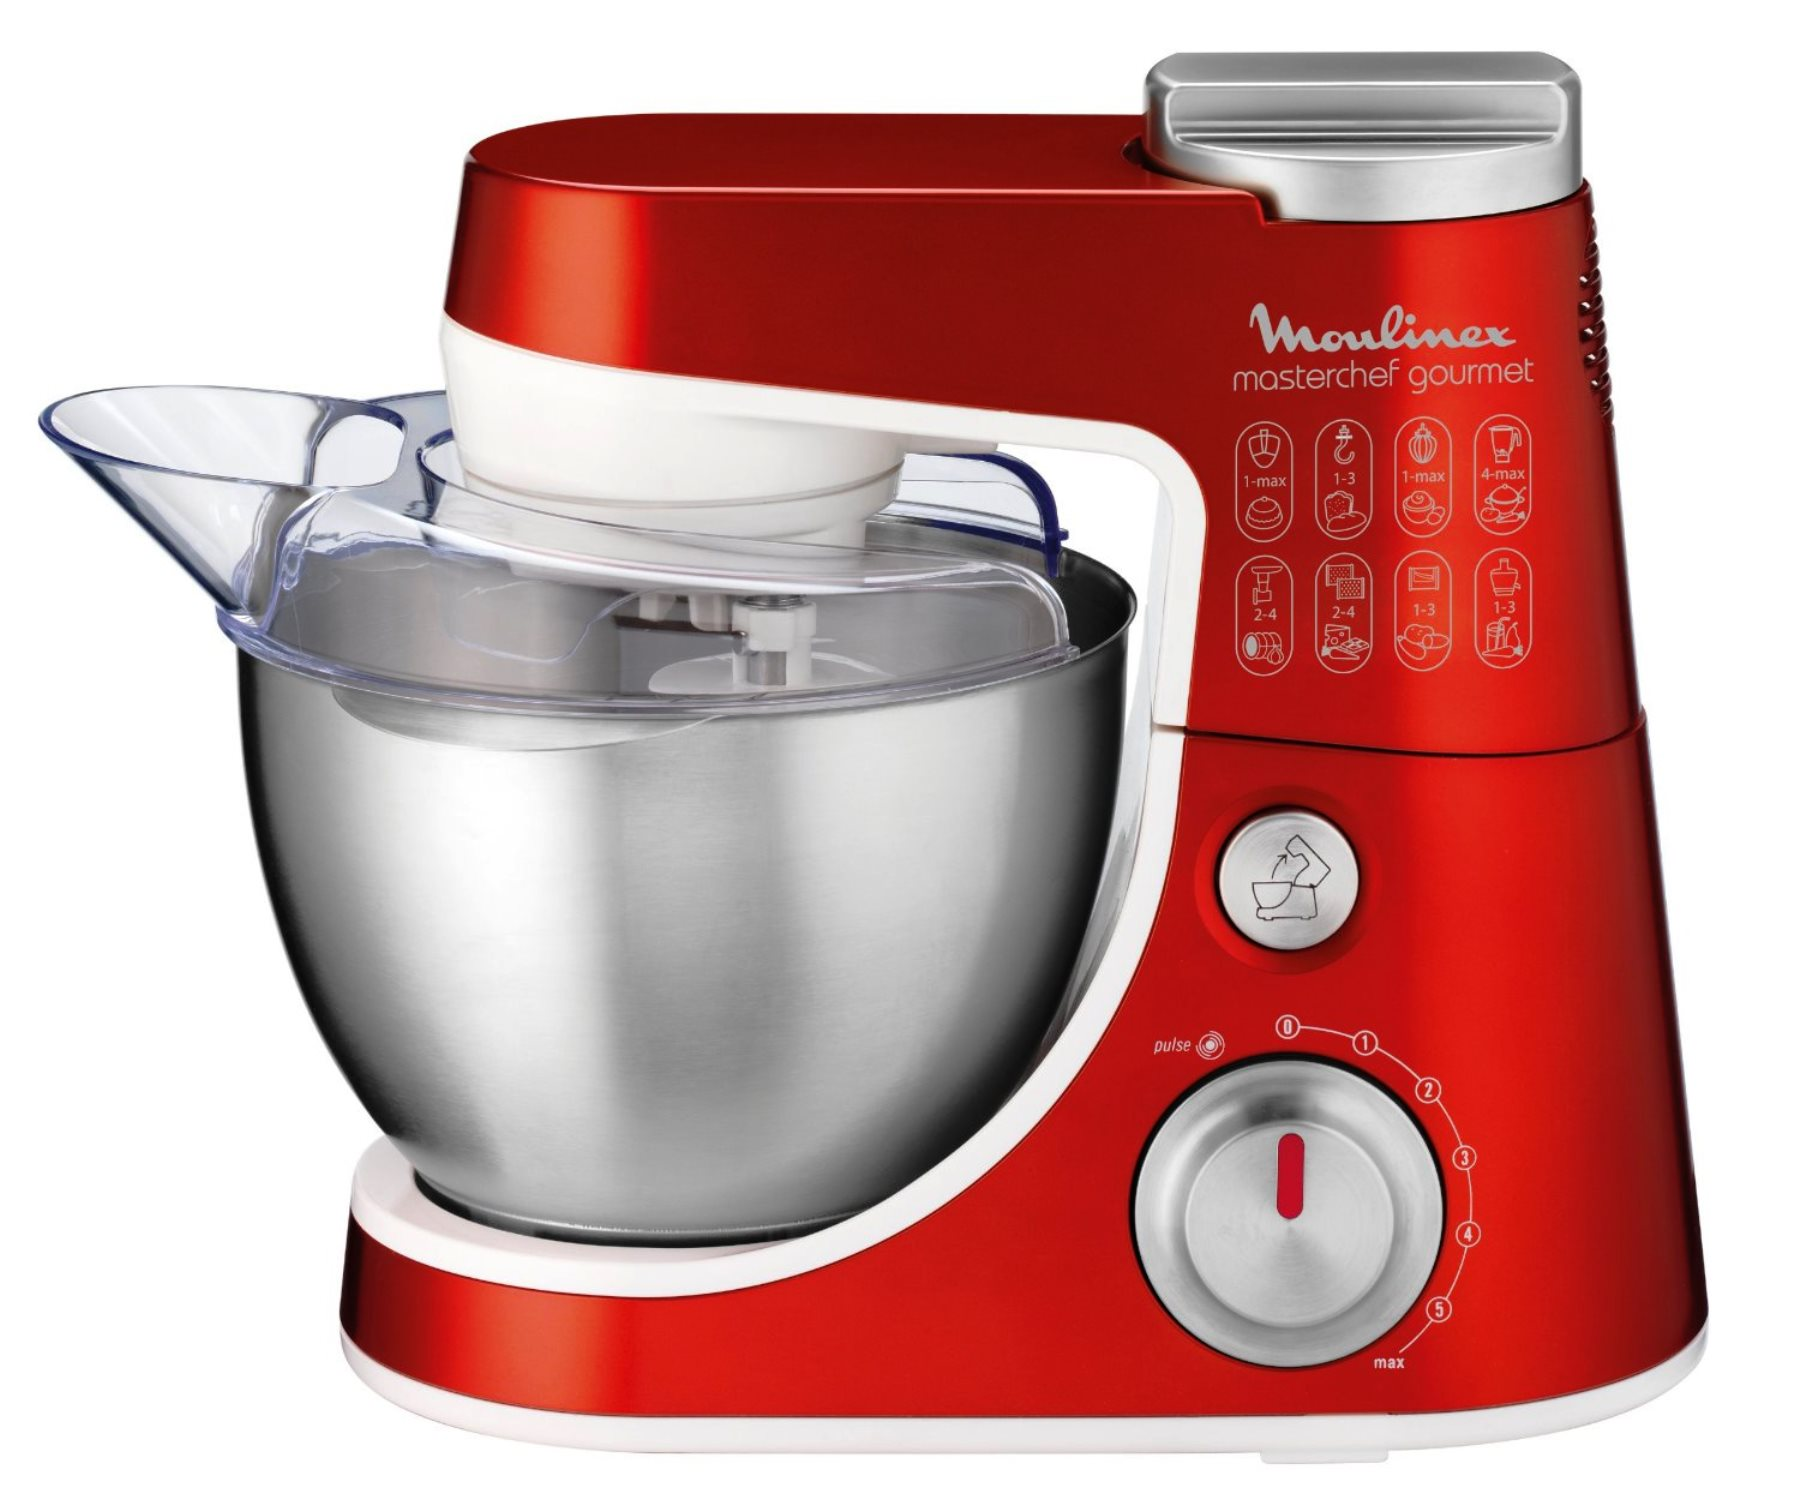 Moulinex qa403gb1 masterchef gourmet impastatrice e robot da cucina - Robot da cucina moulinex ...